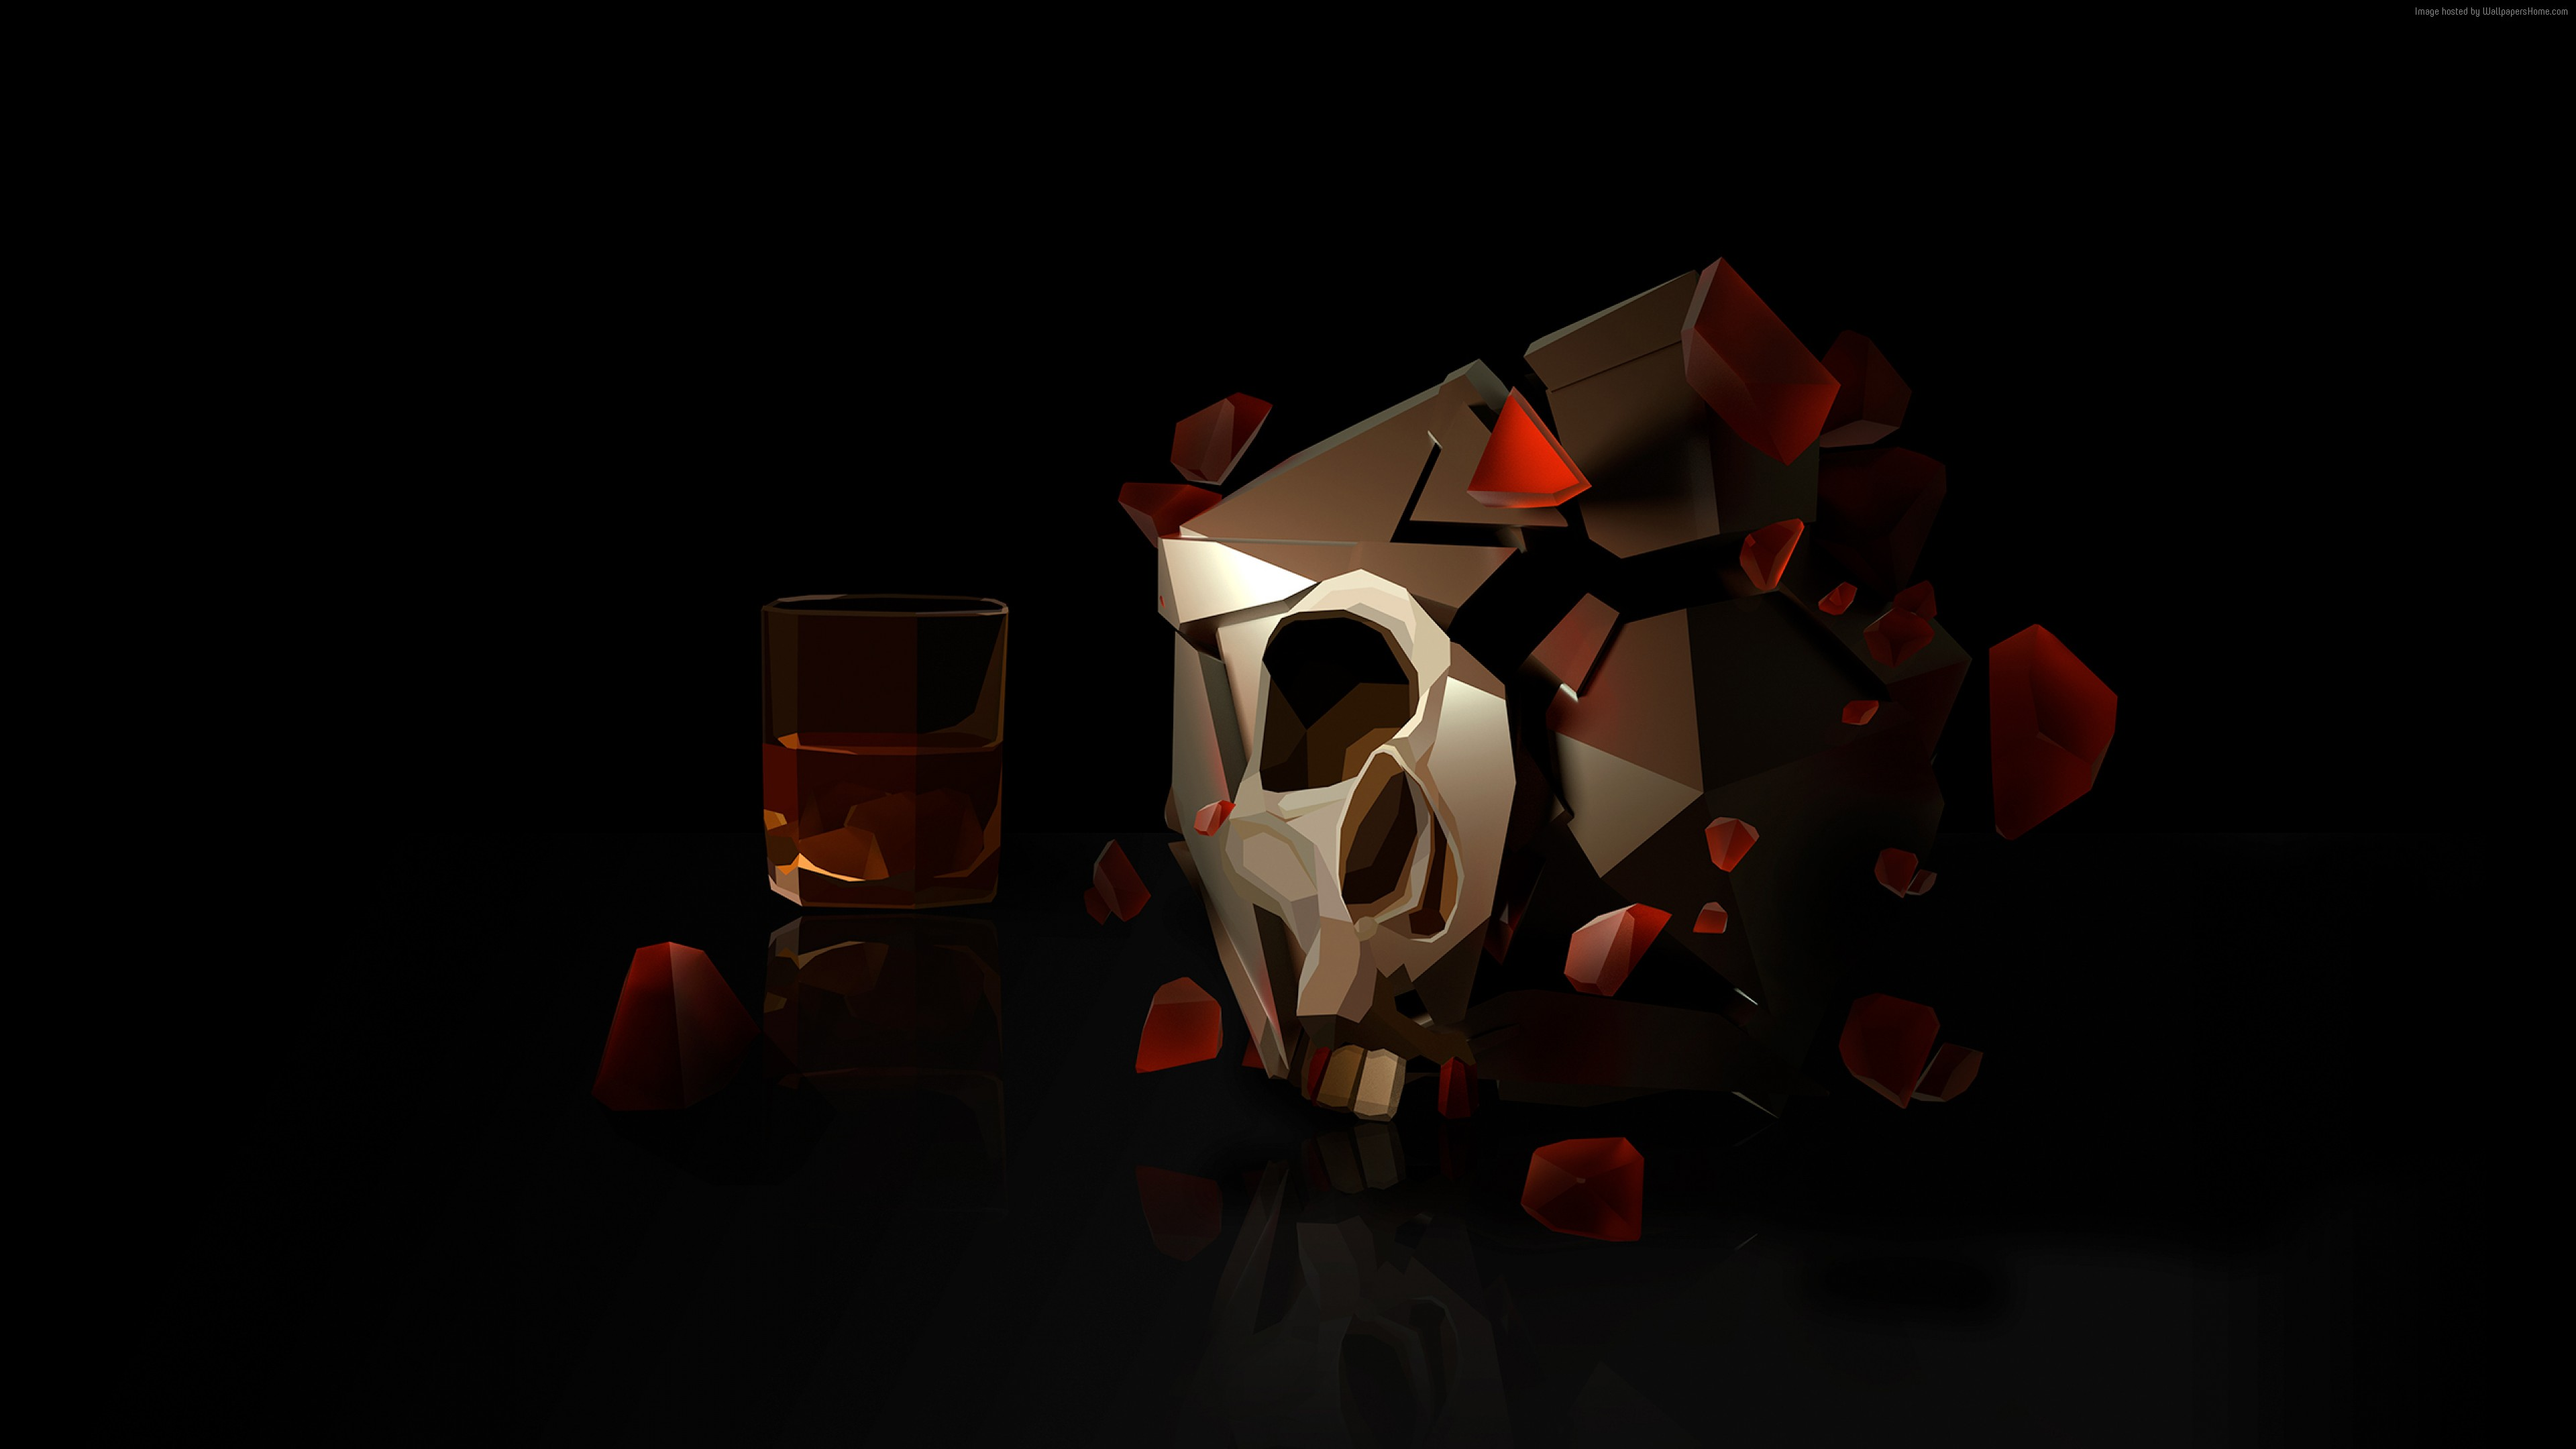 wallpaper skull, 3d, glass, hd, abstract 3d, glass, hd, skull